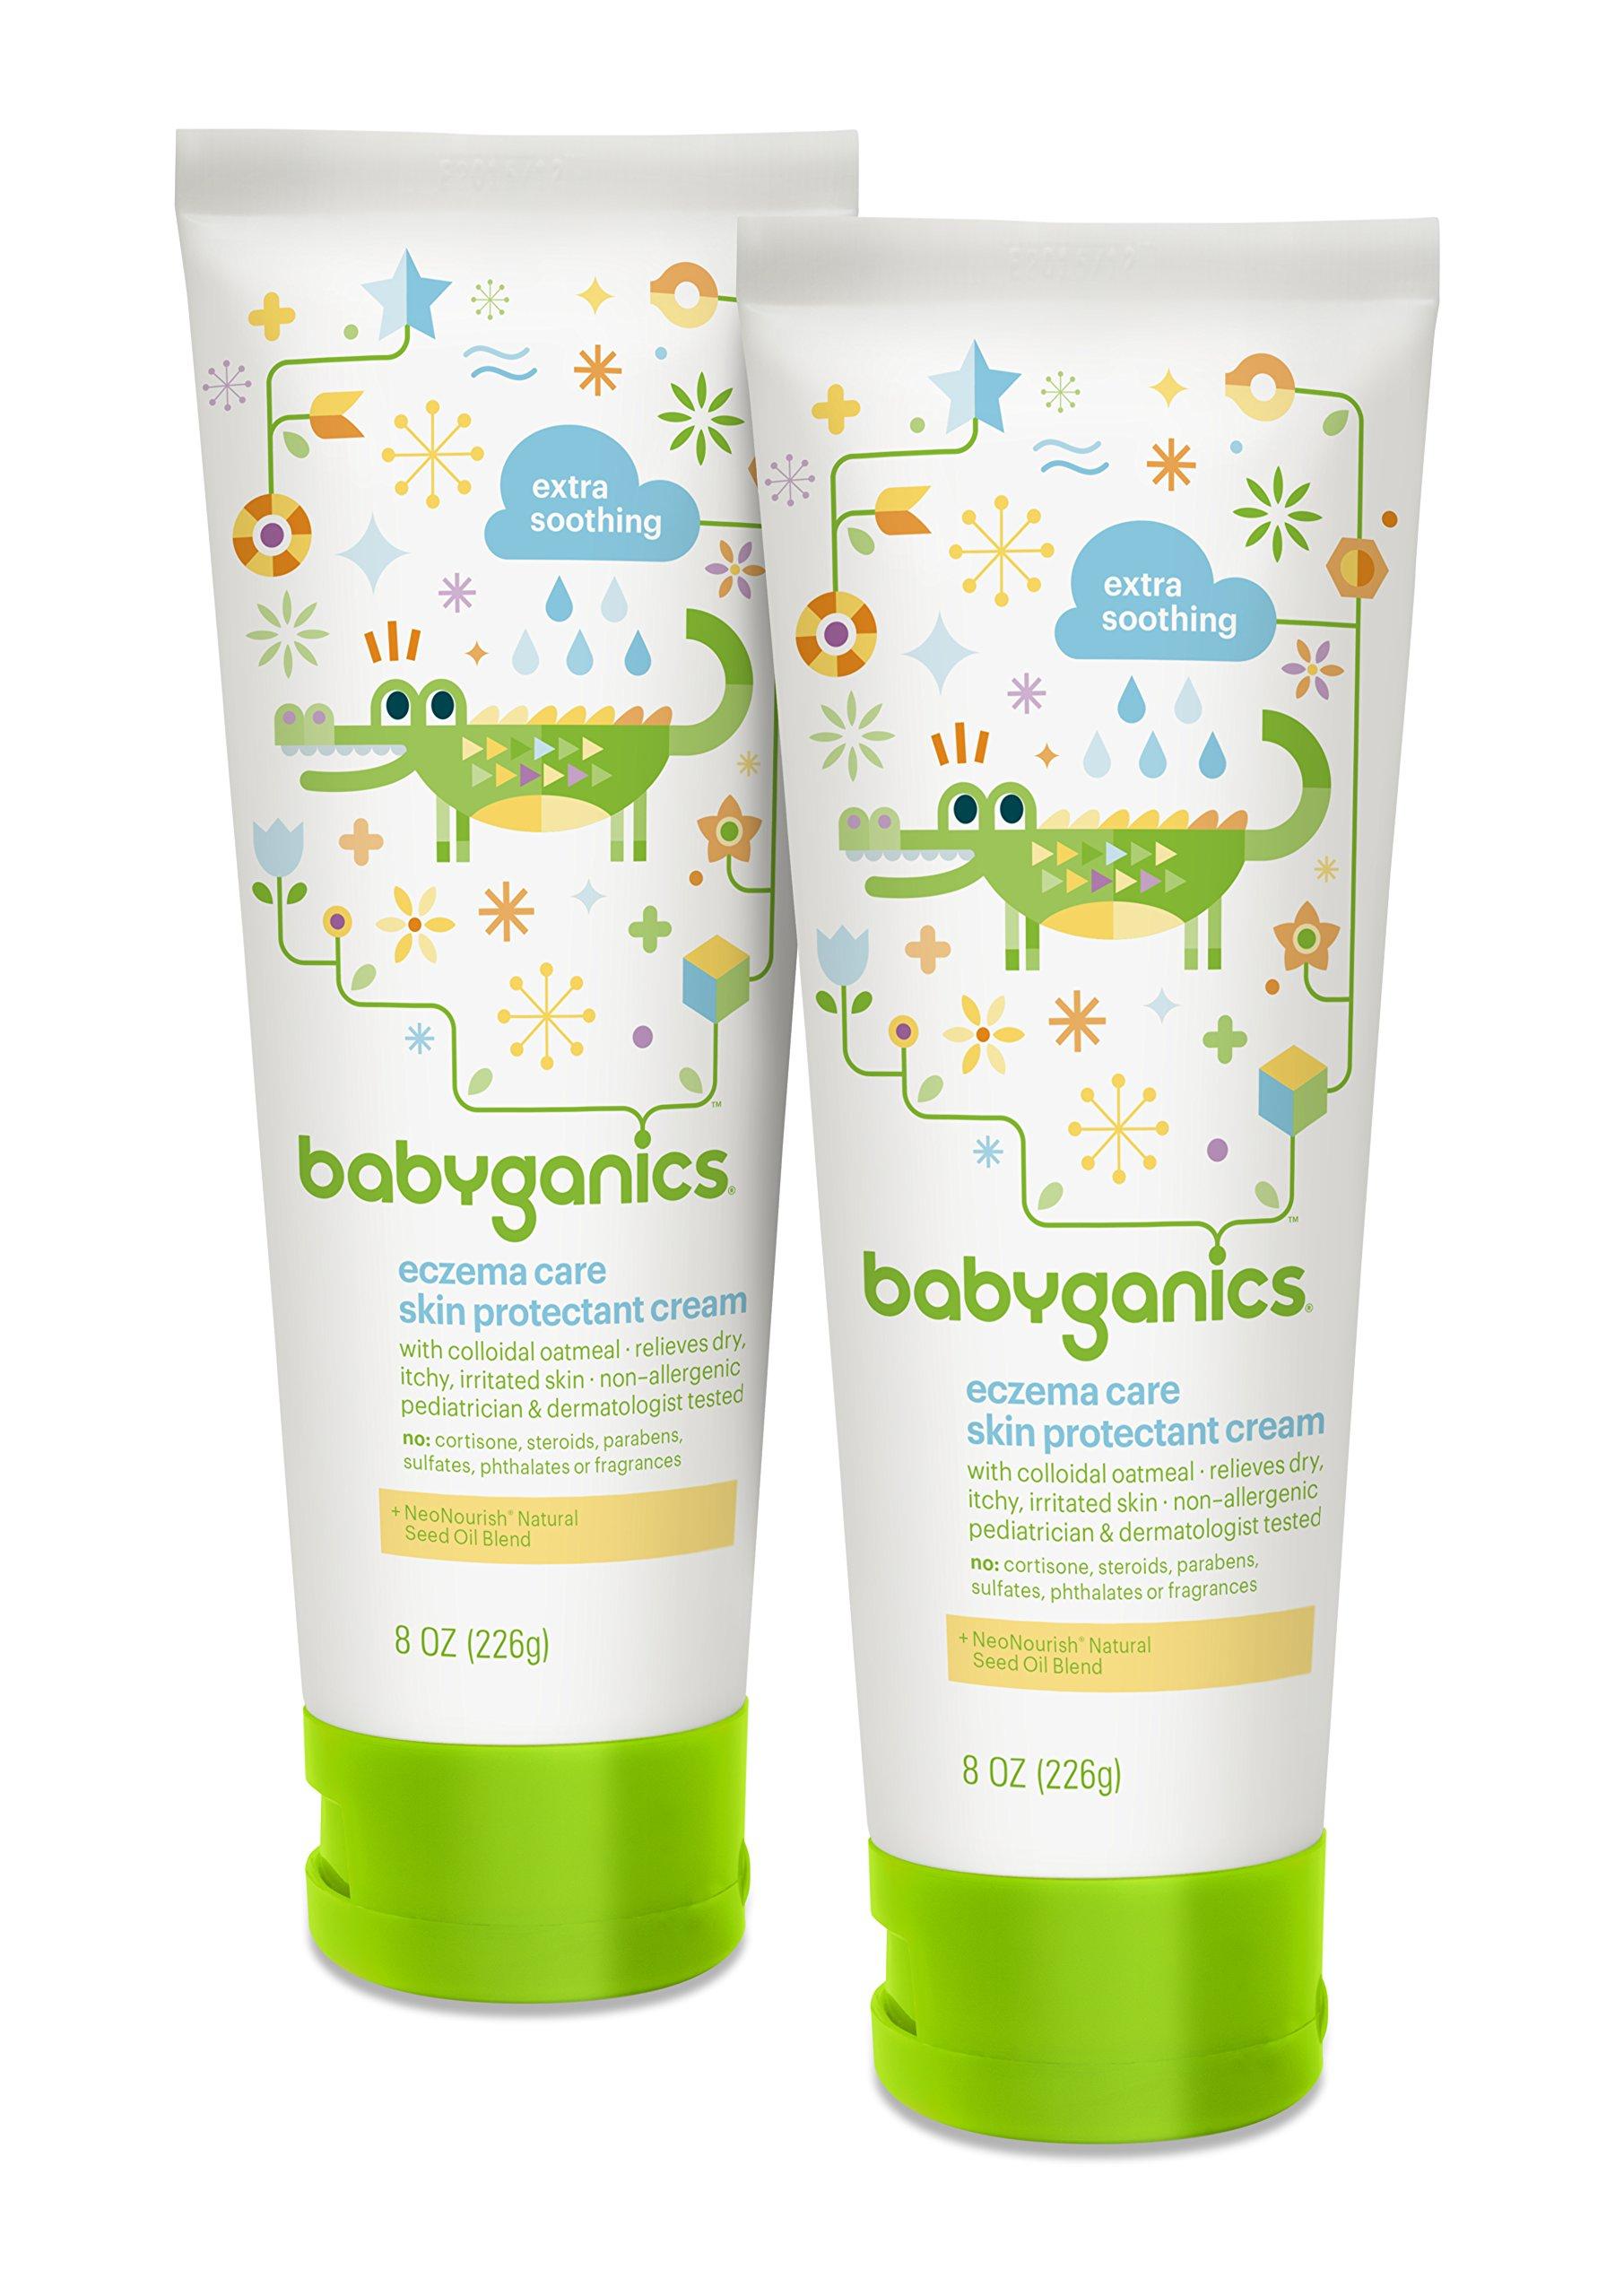 Babyganics Eczema Care Skin Protectant Cream, 8 oz Tube (Pack of 2)